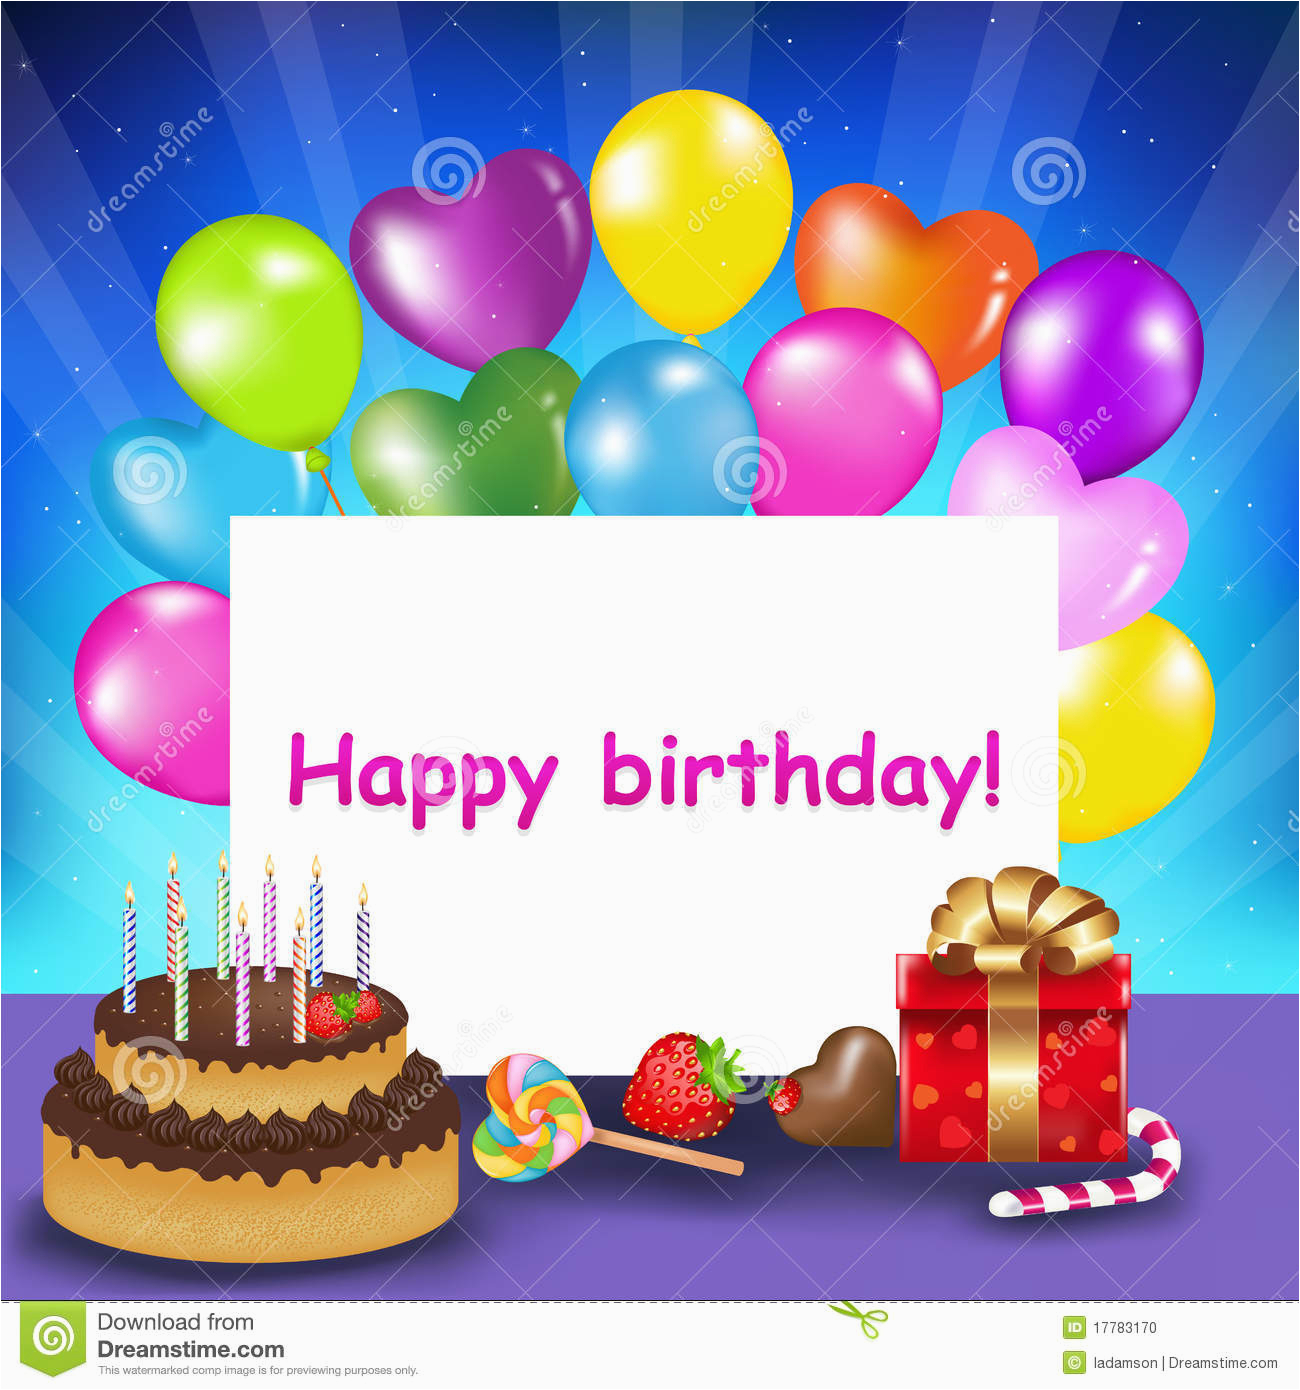 happy birthday cards online free inside ucwords card